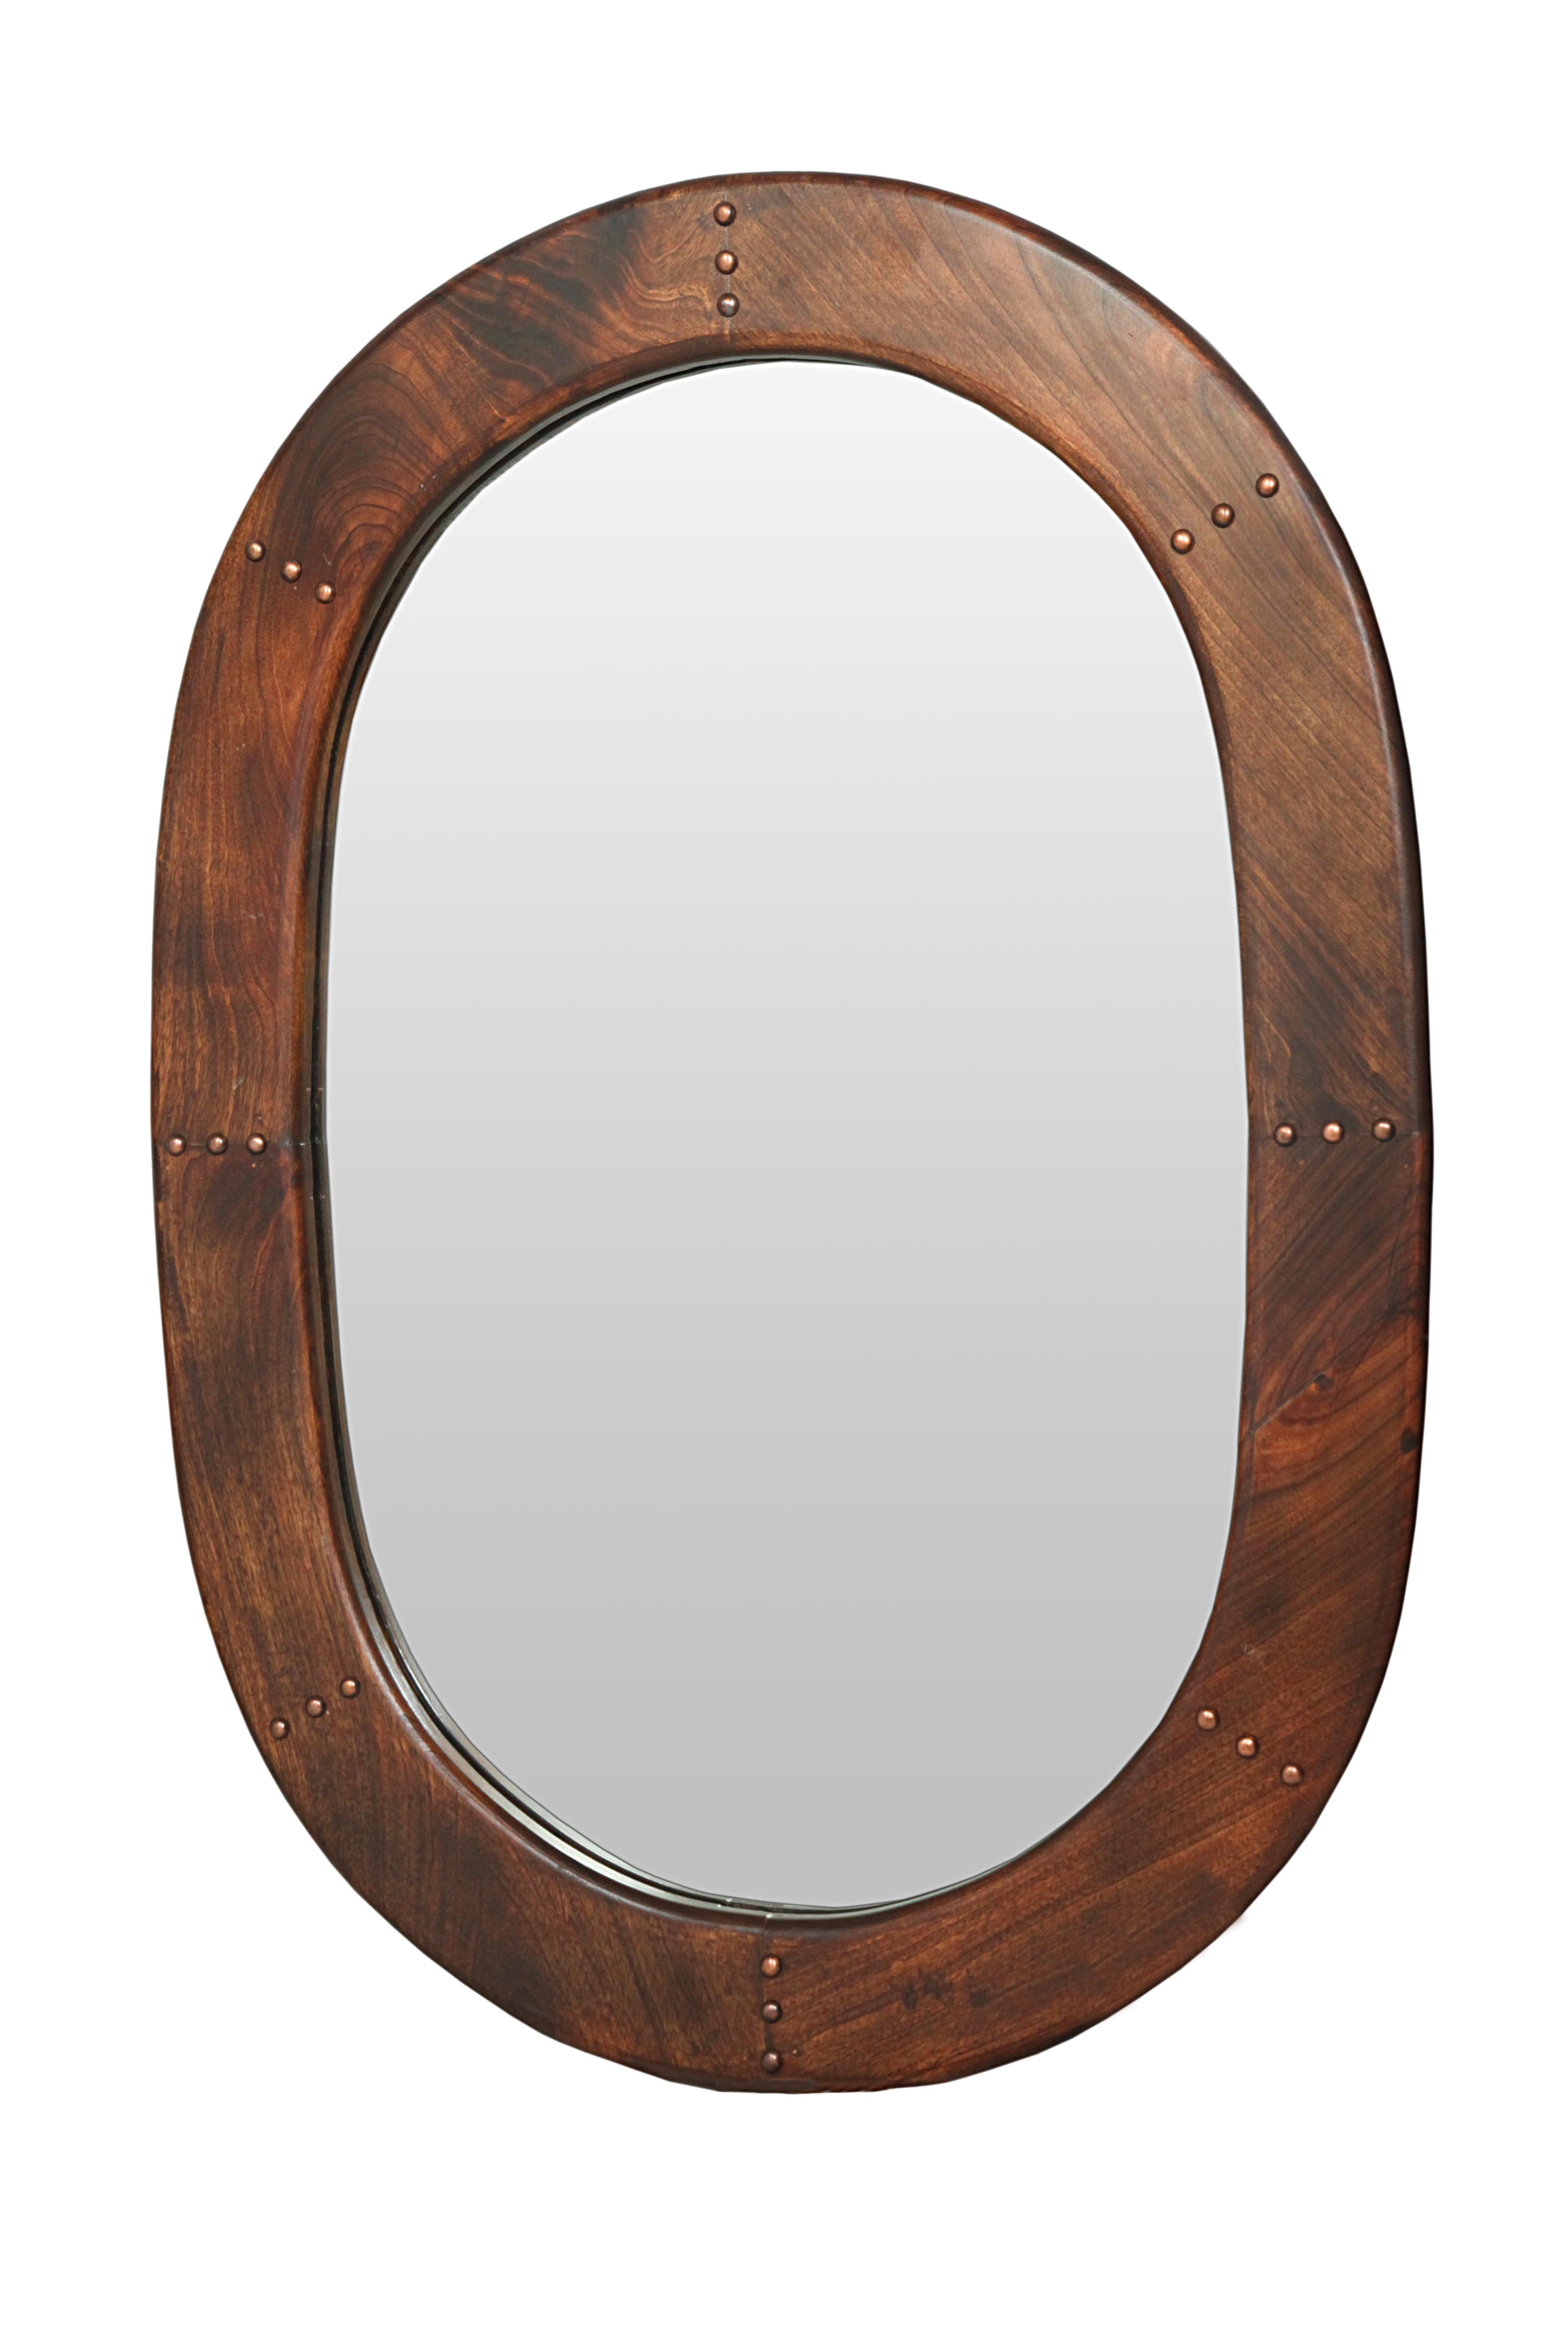 Wooden Oval Frame